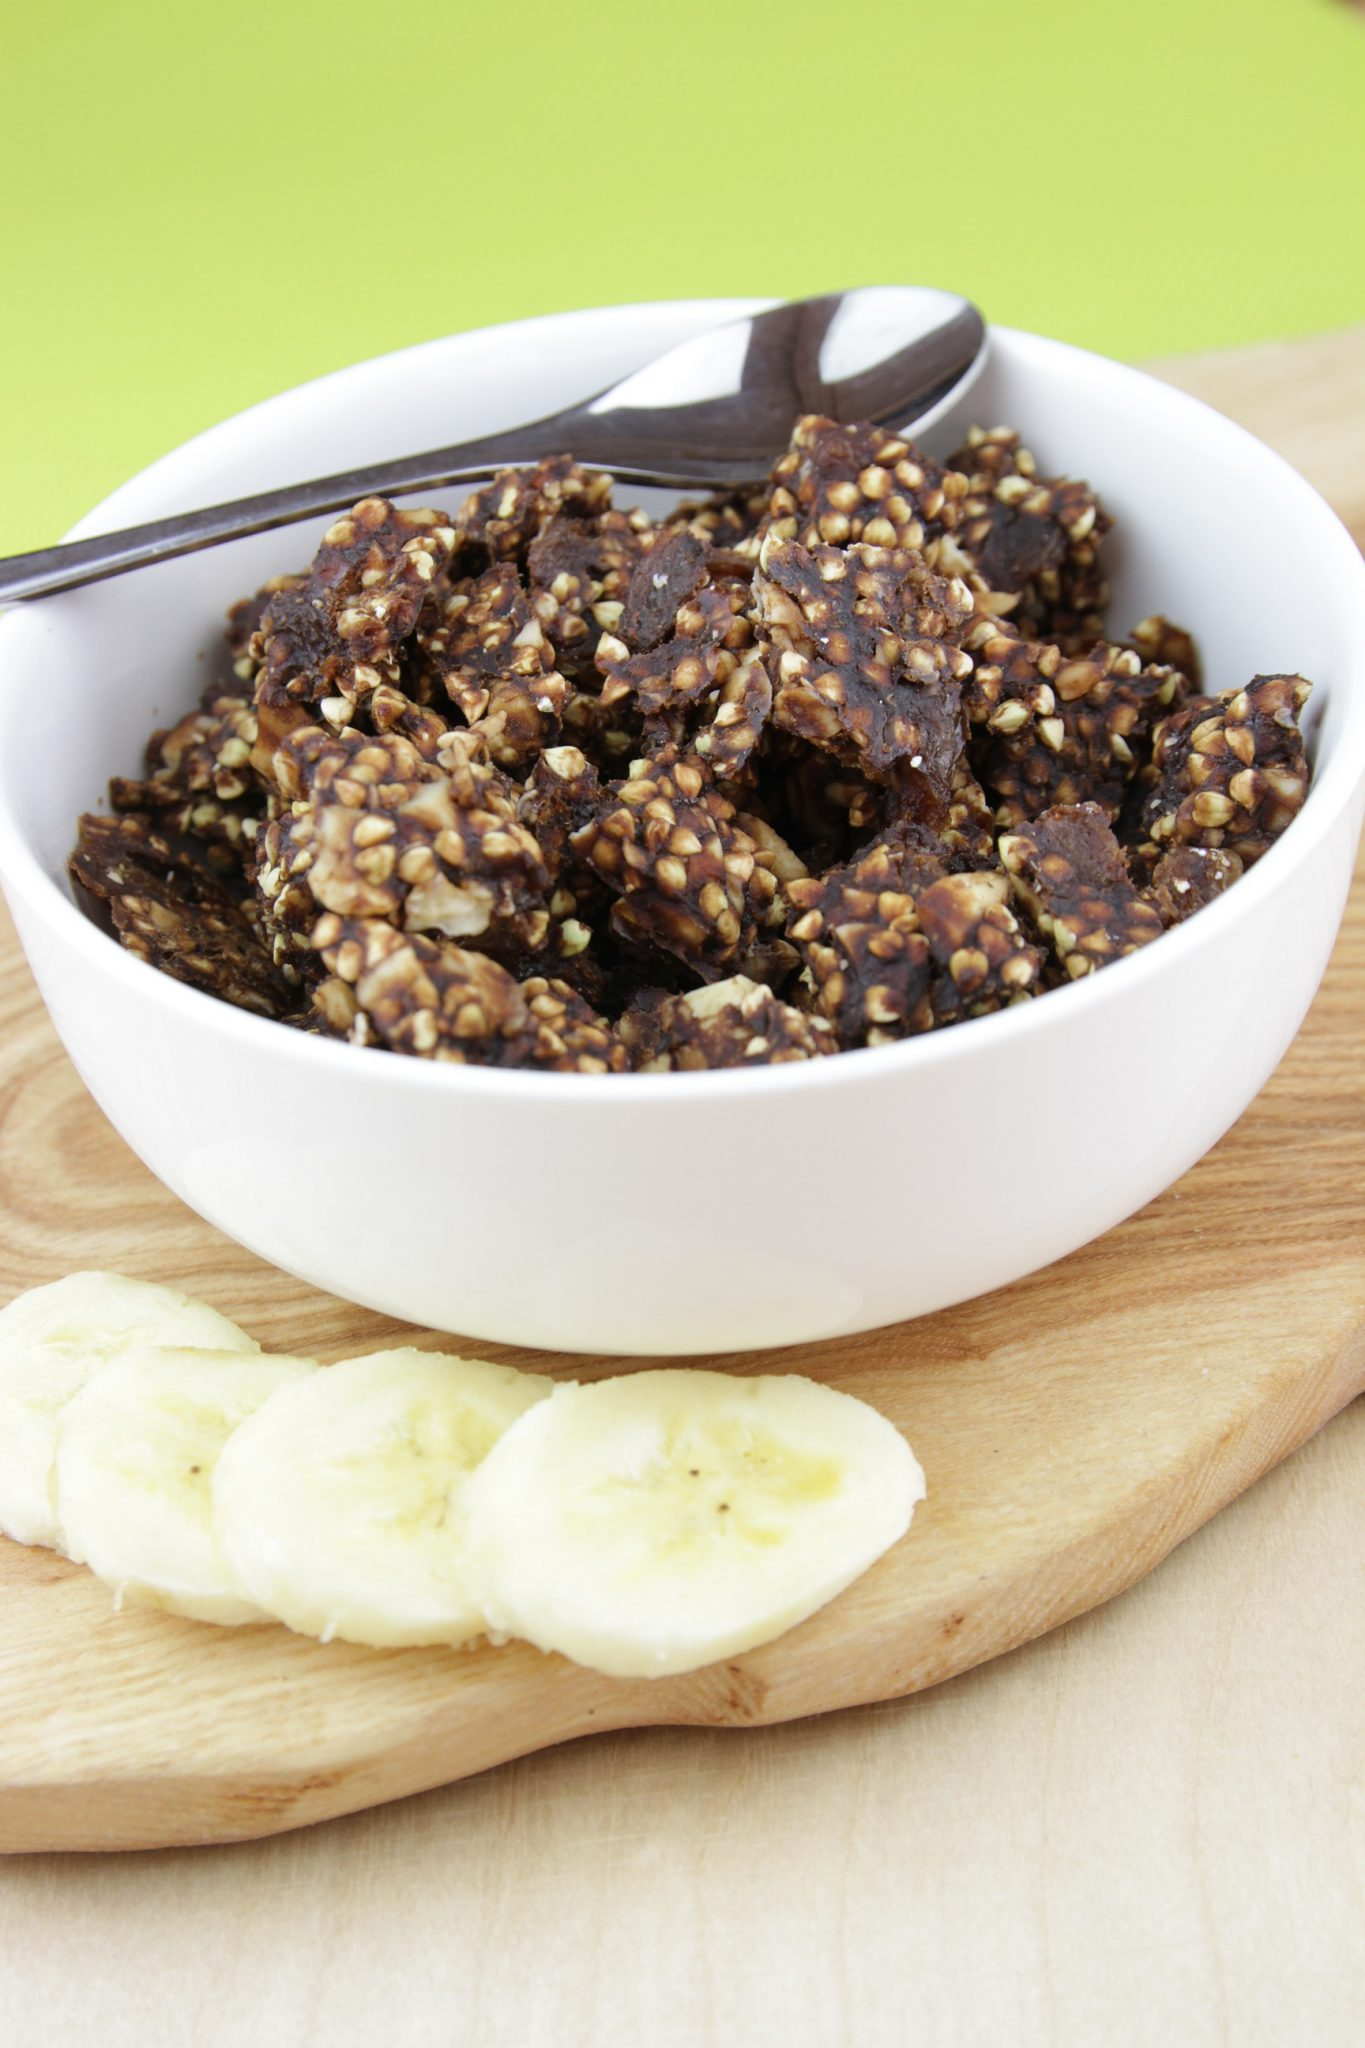 krunola cacao cru banane qualit crue petit d jeuner 280 g biosaine cuisine. Black Bedroom Furniture Sets. Home Design Ideas